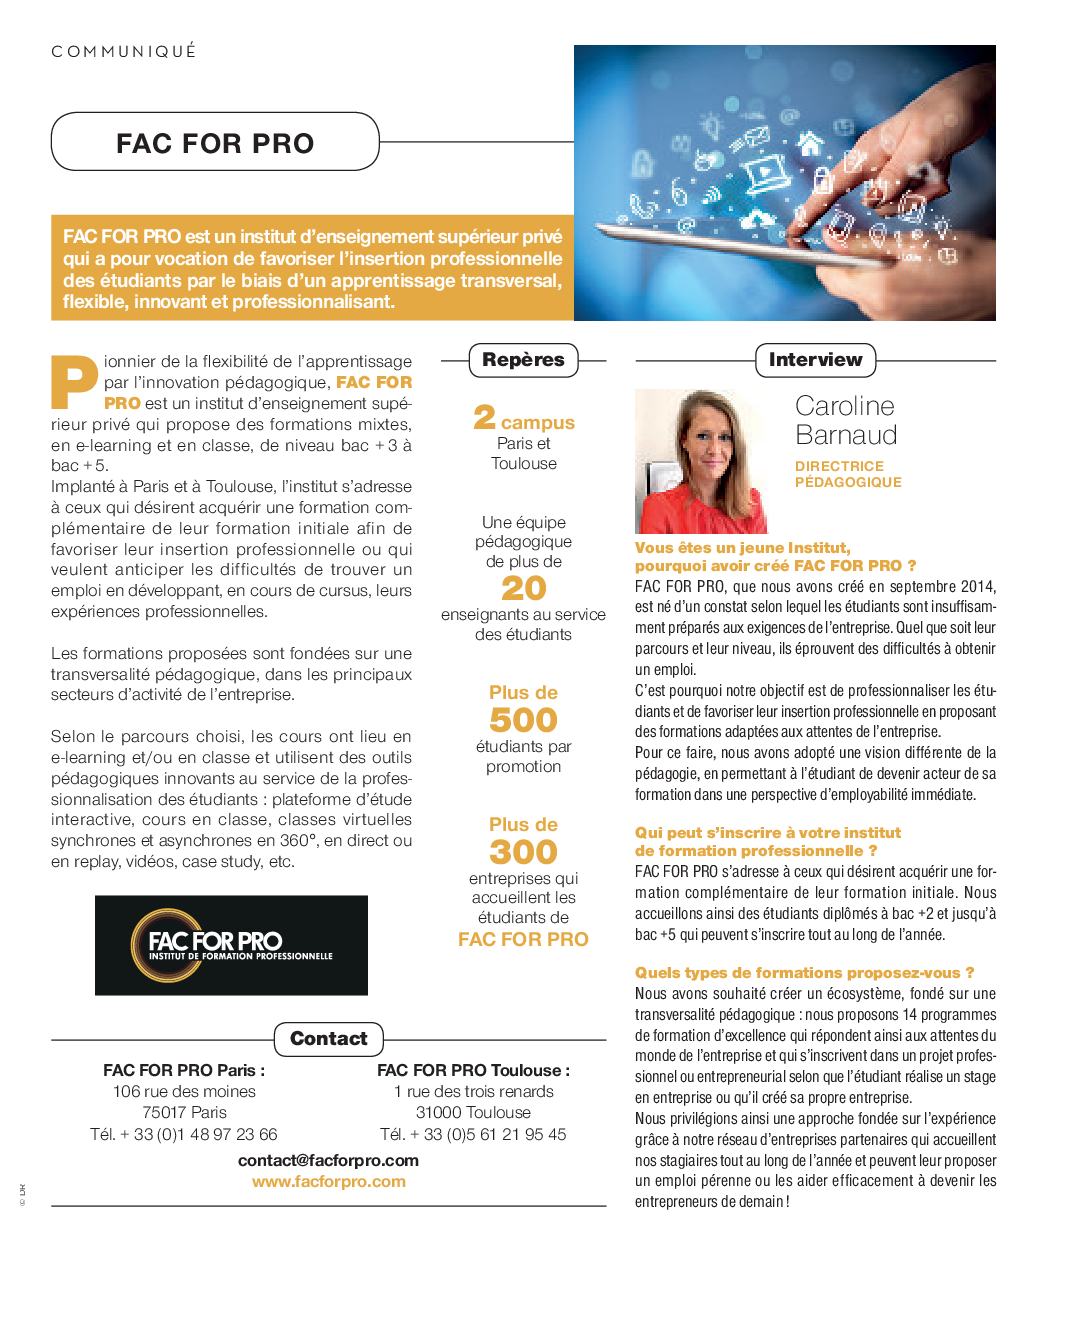 guide entreprise facforpro 2